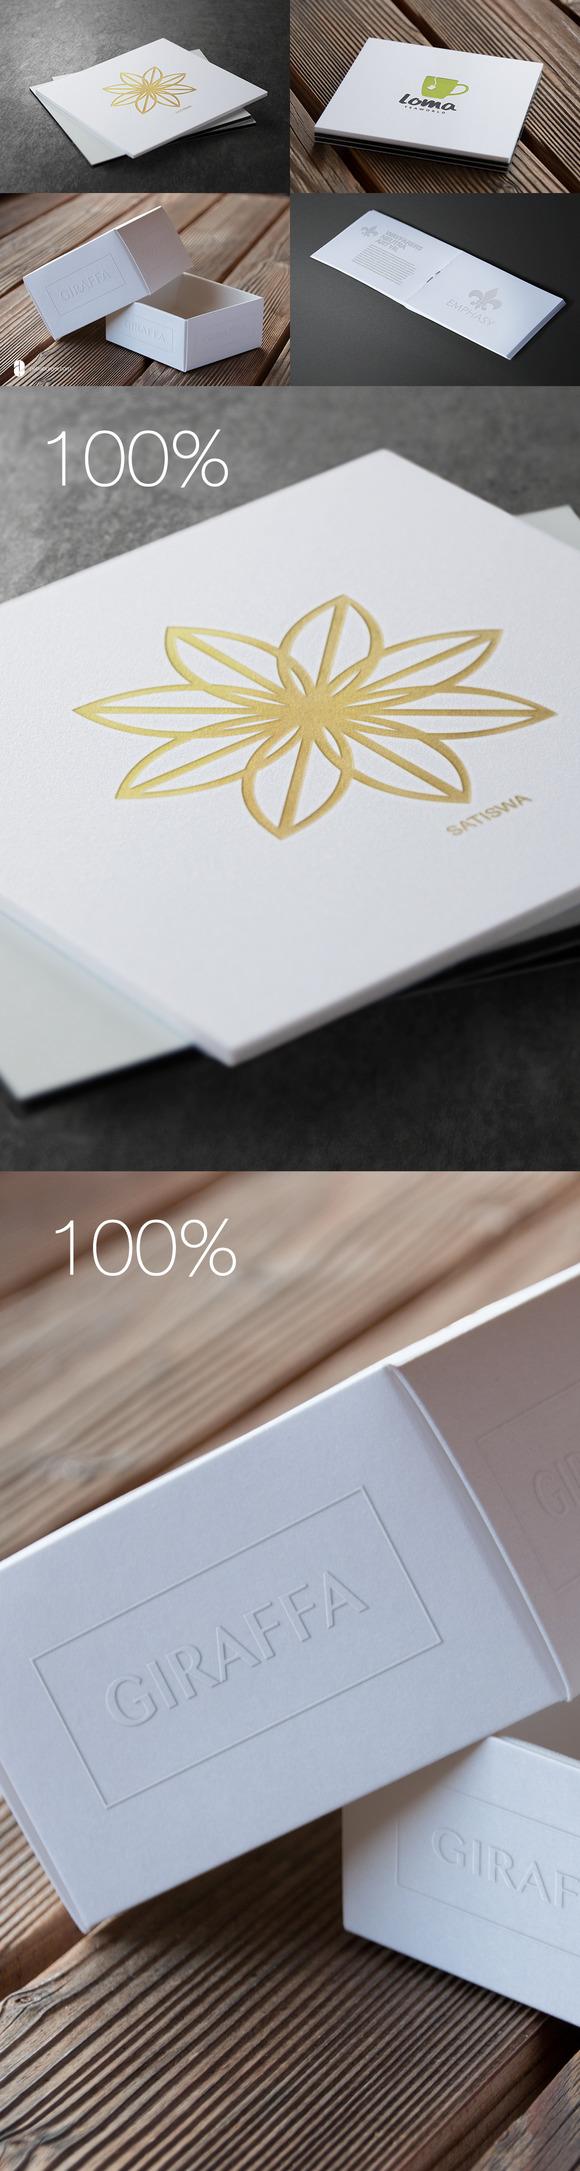 Authentic Logo Mix Mockups Vol. 01 - Product Mockups